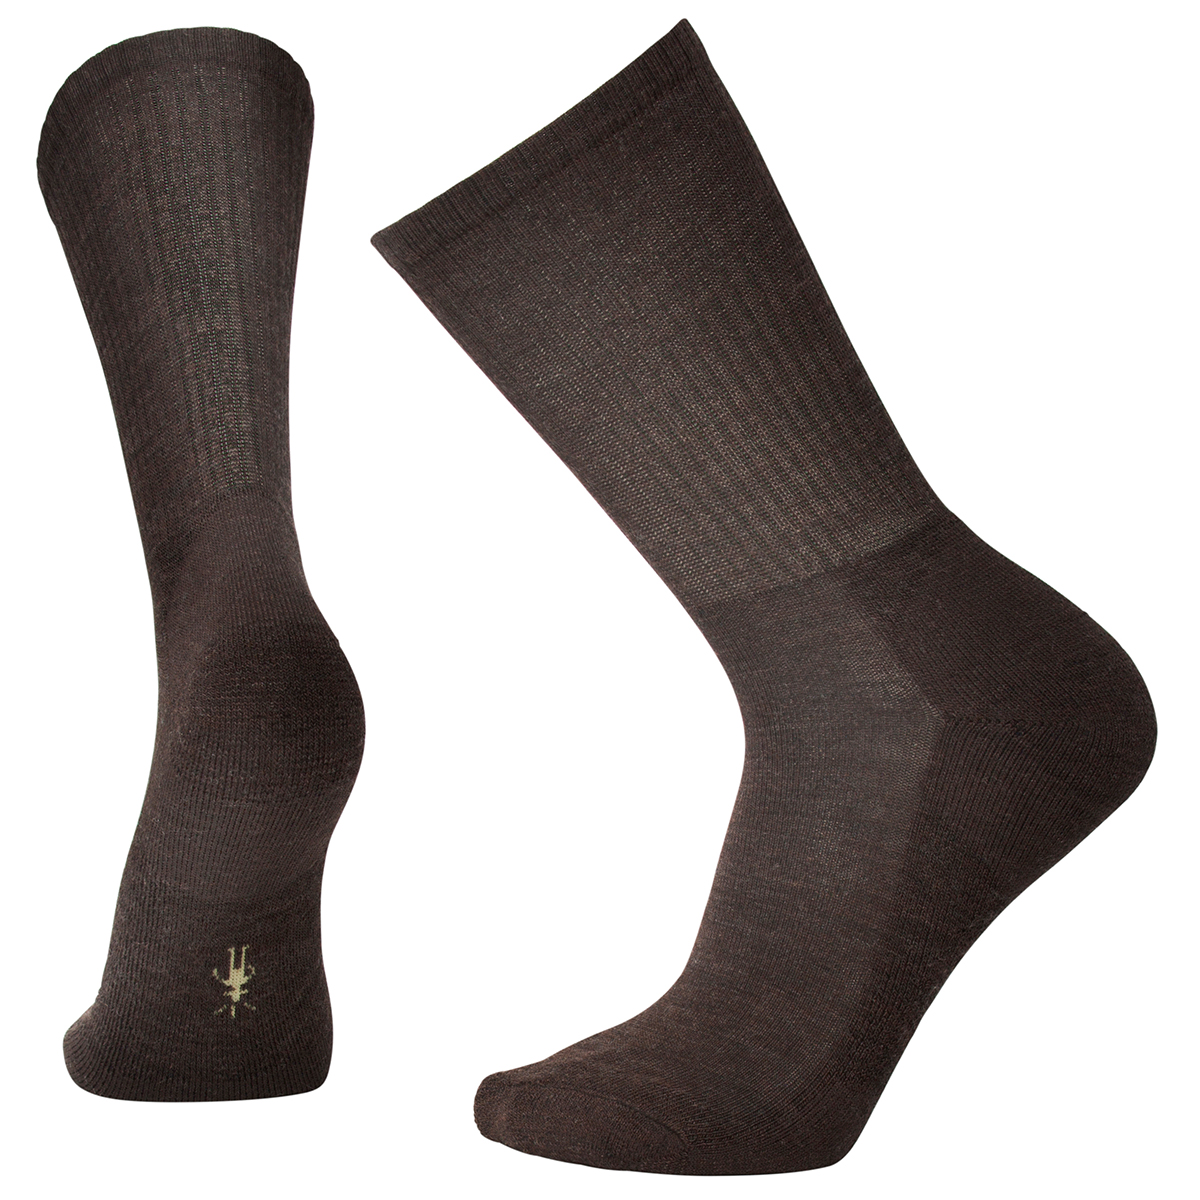 Smartwool Men's Heathered Rib Socks